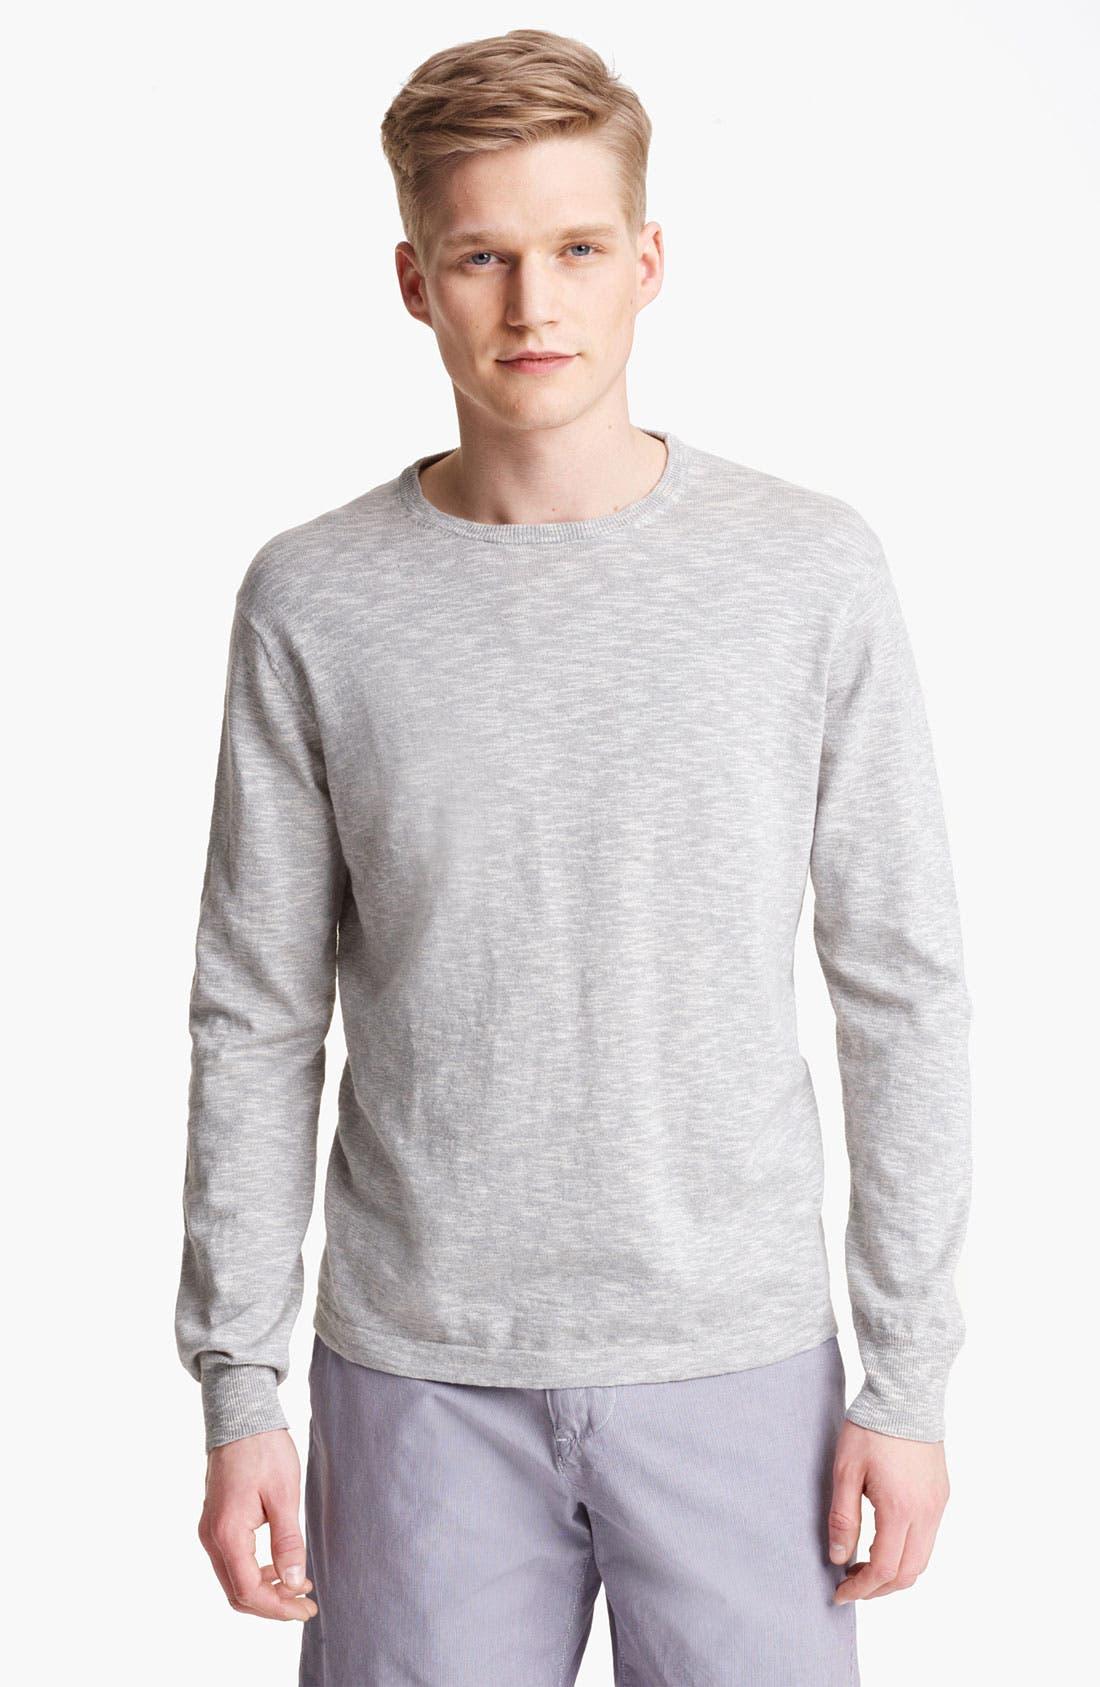 Main Image - Save Khaki Slub Knit Sweater